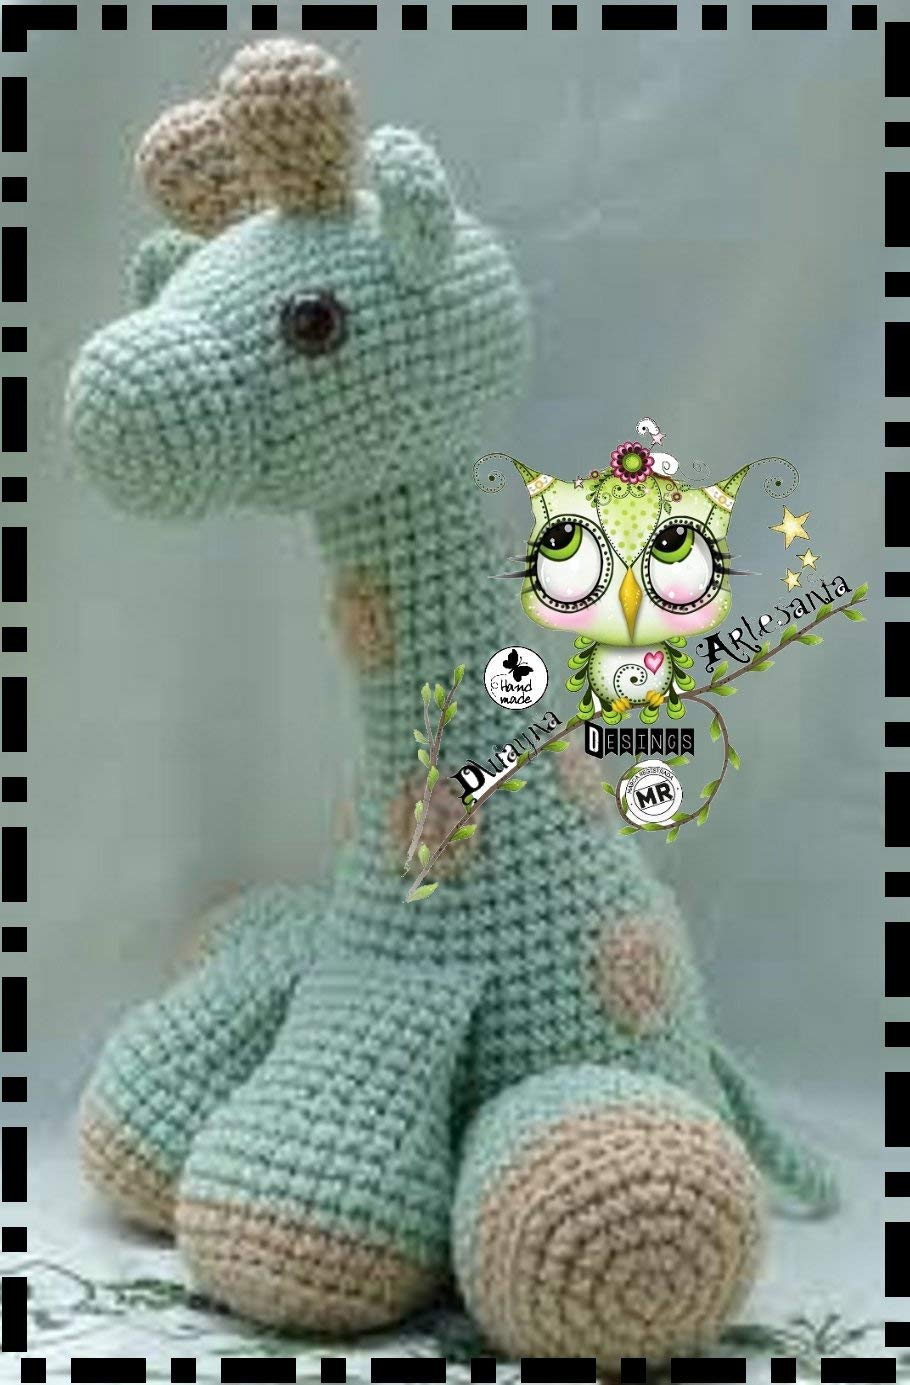 JIRAFA TOPOS AMIGURUMI (Bebé, crochet, ganchillo, muñeco, peluche, niño, niña, lana) : Amazon.es: Handmade